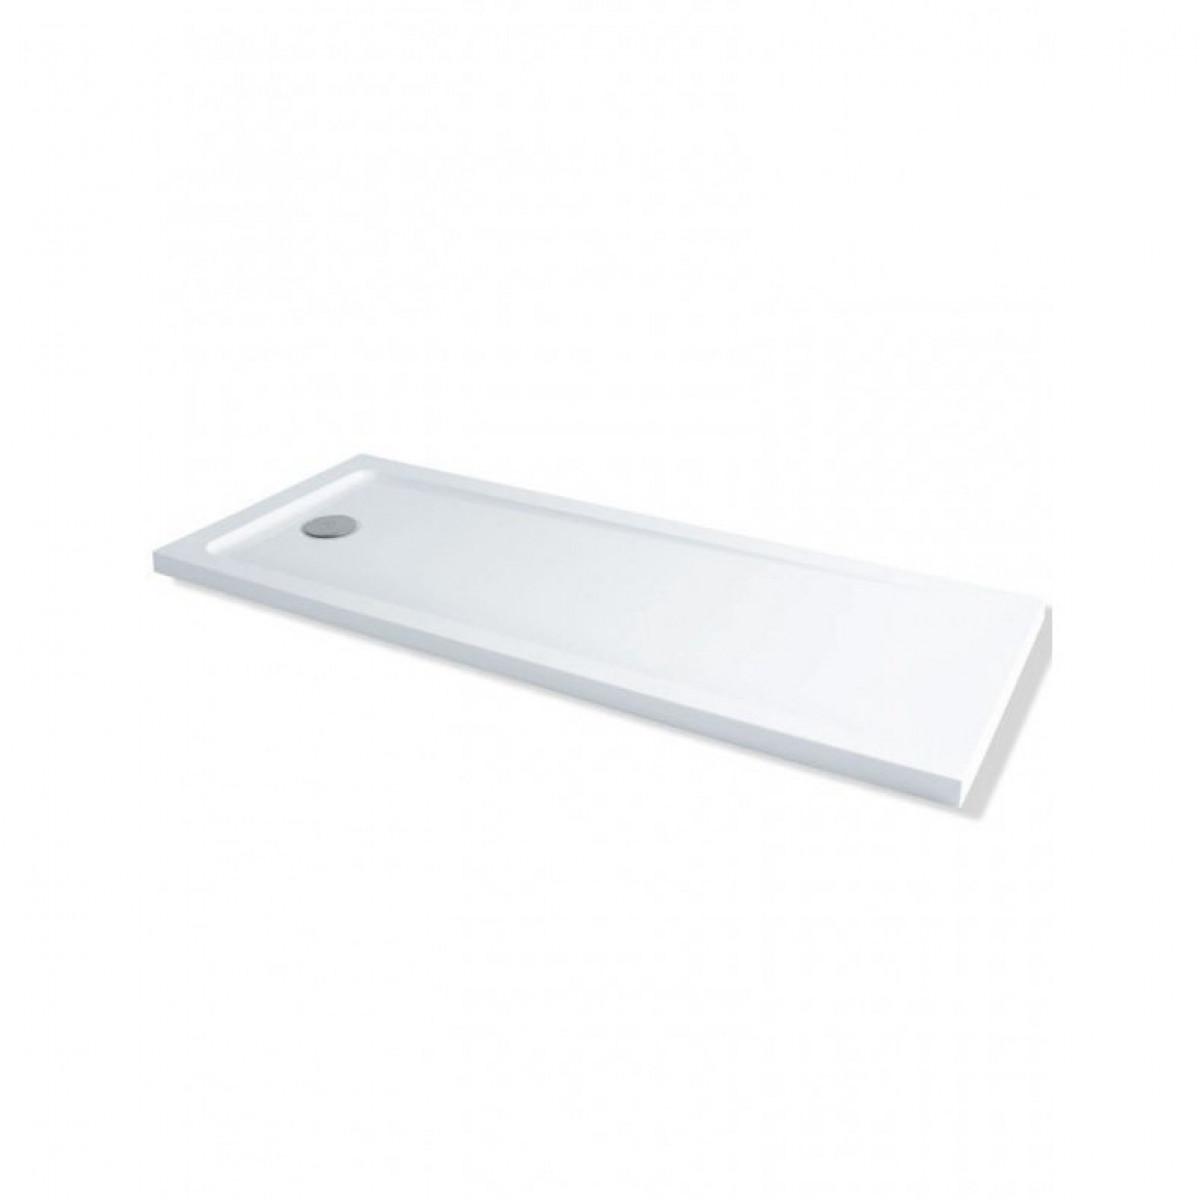 1700 x 700 Rectangular Shower Tray Durastone Low Profile | XFU